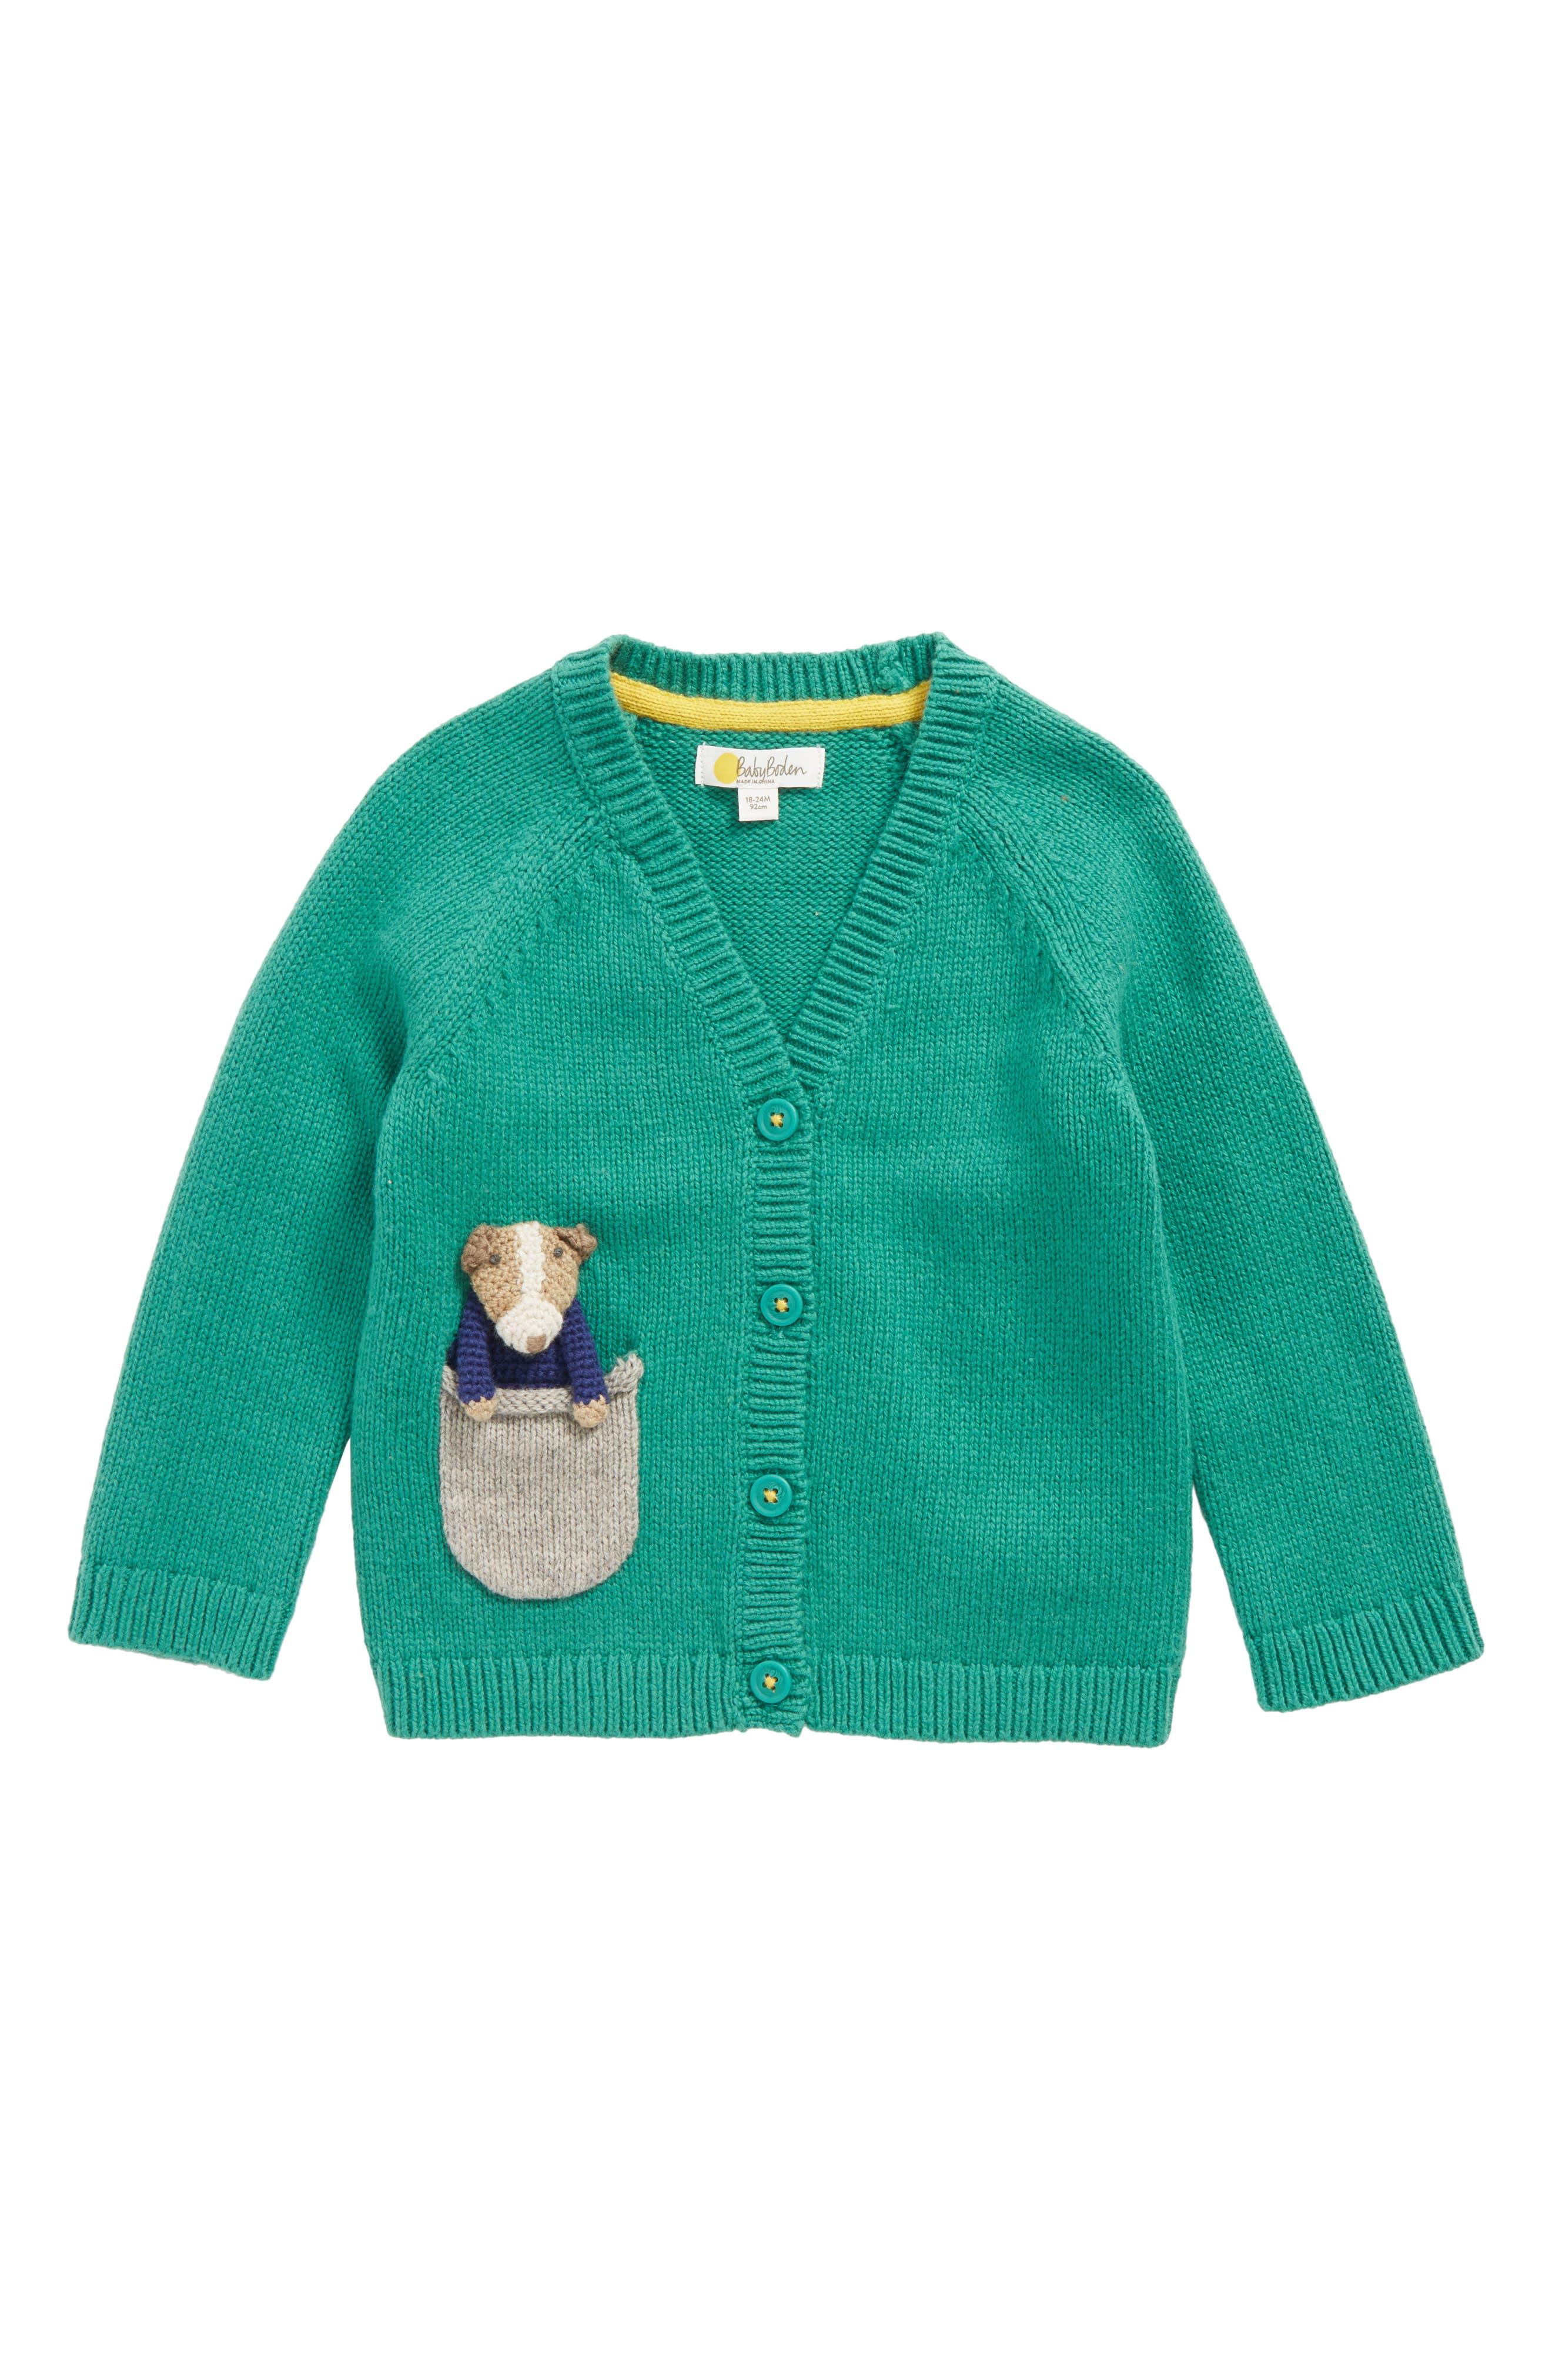 Pocket Pet Cardigan,                         Main,                         color, 315